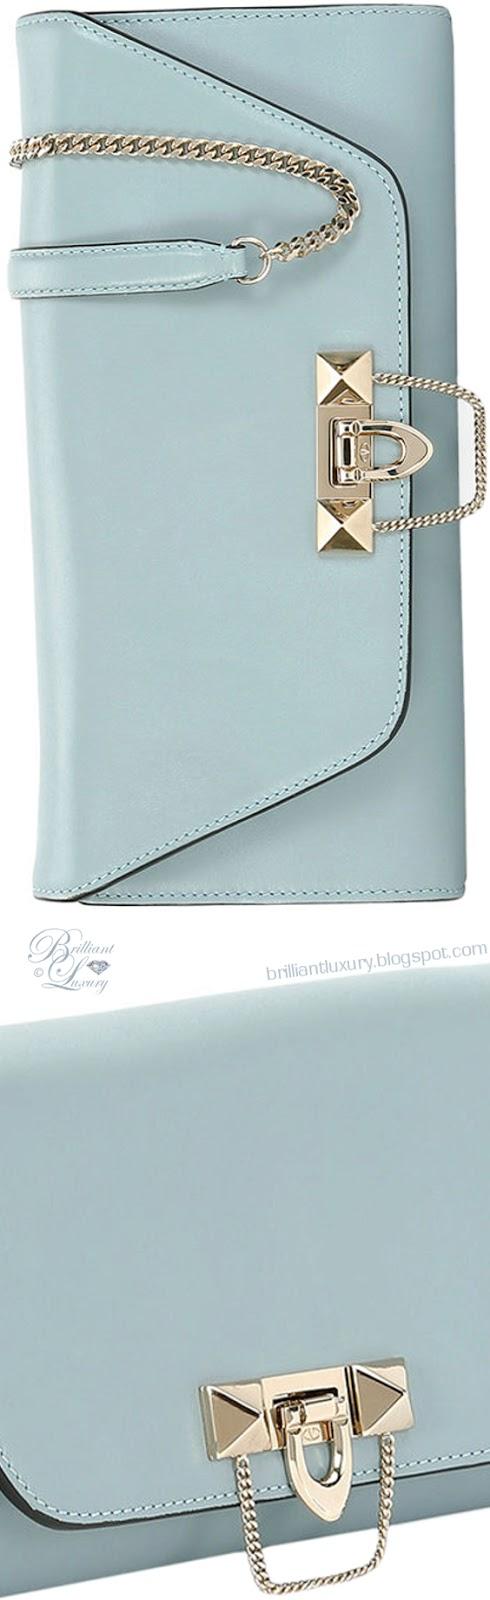 Brilliant Luxury ♦ Valentino Garavani Demilune leather chain clutch bag